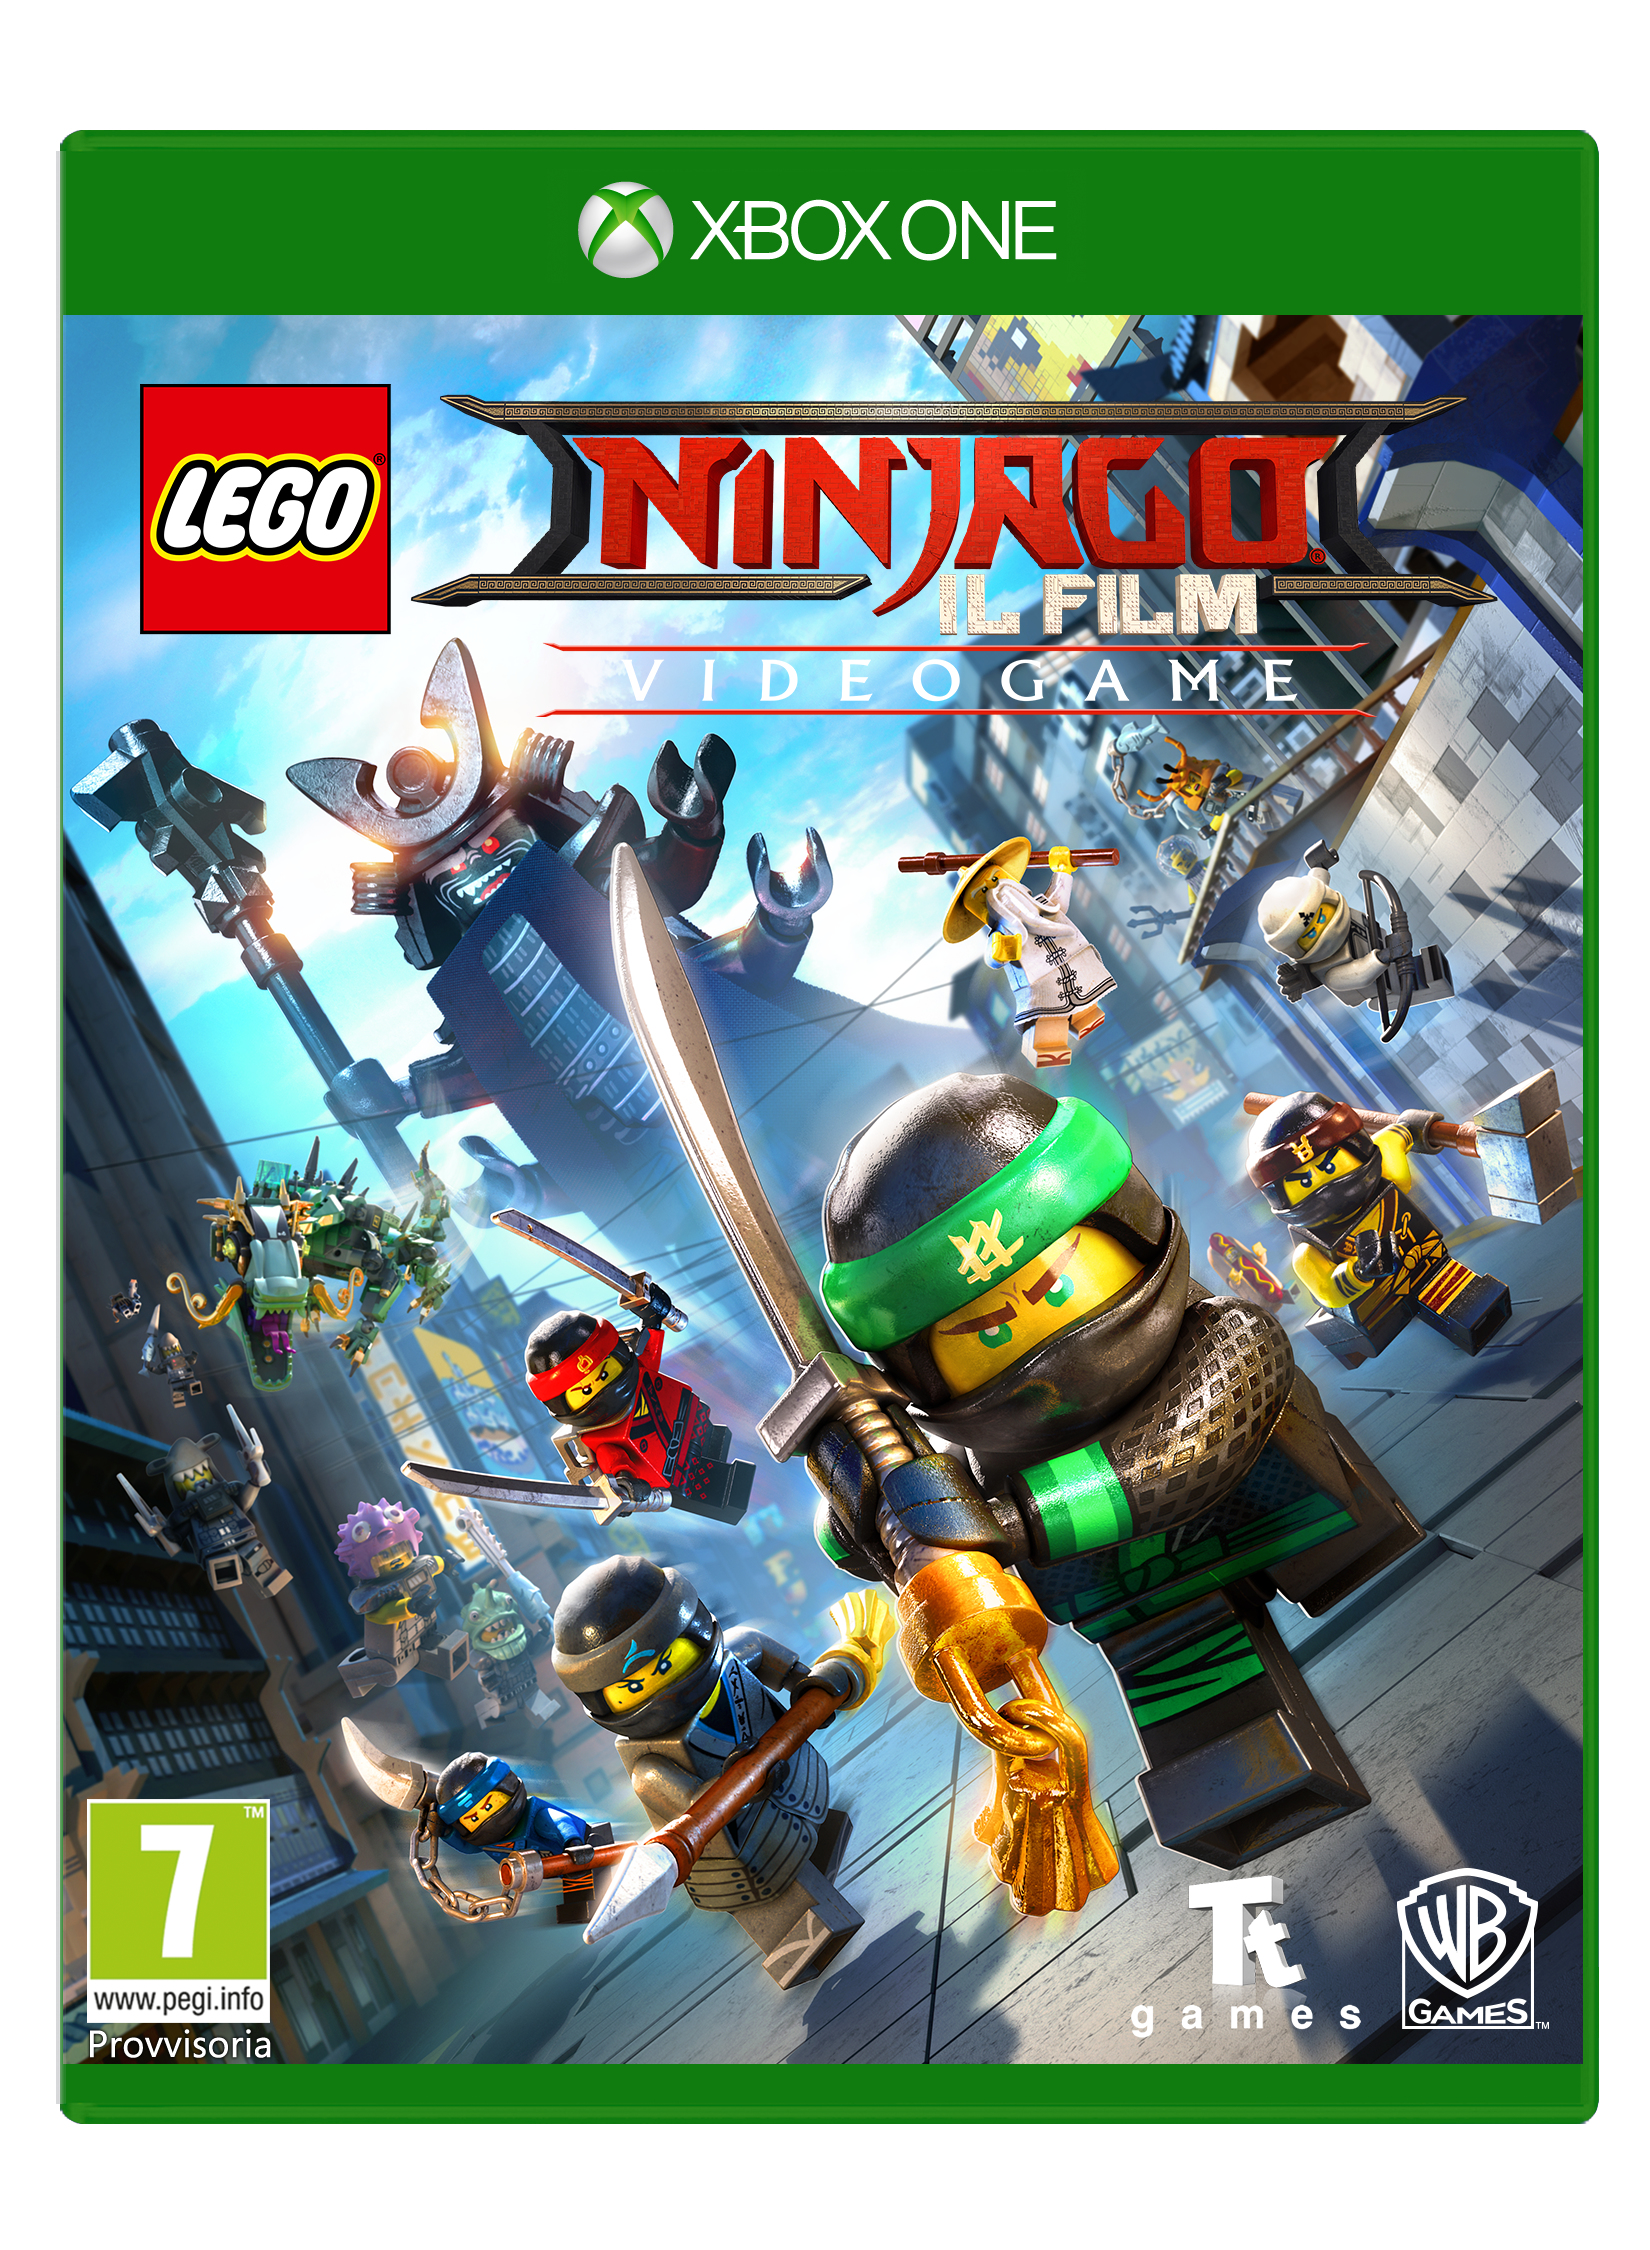 Warner Bros Game Lego Ninjago The Movie LEGO Ninjago Il Film Video Game - 1000691202